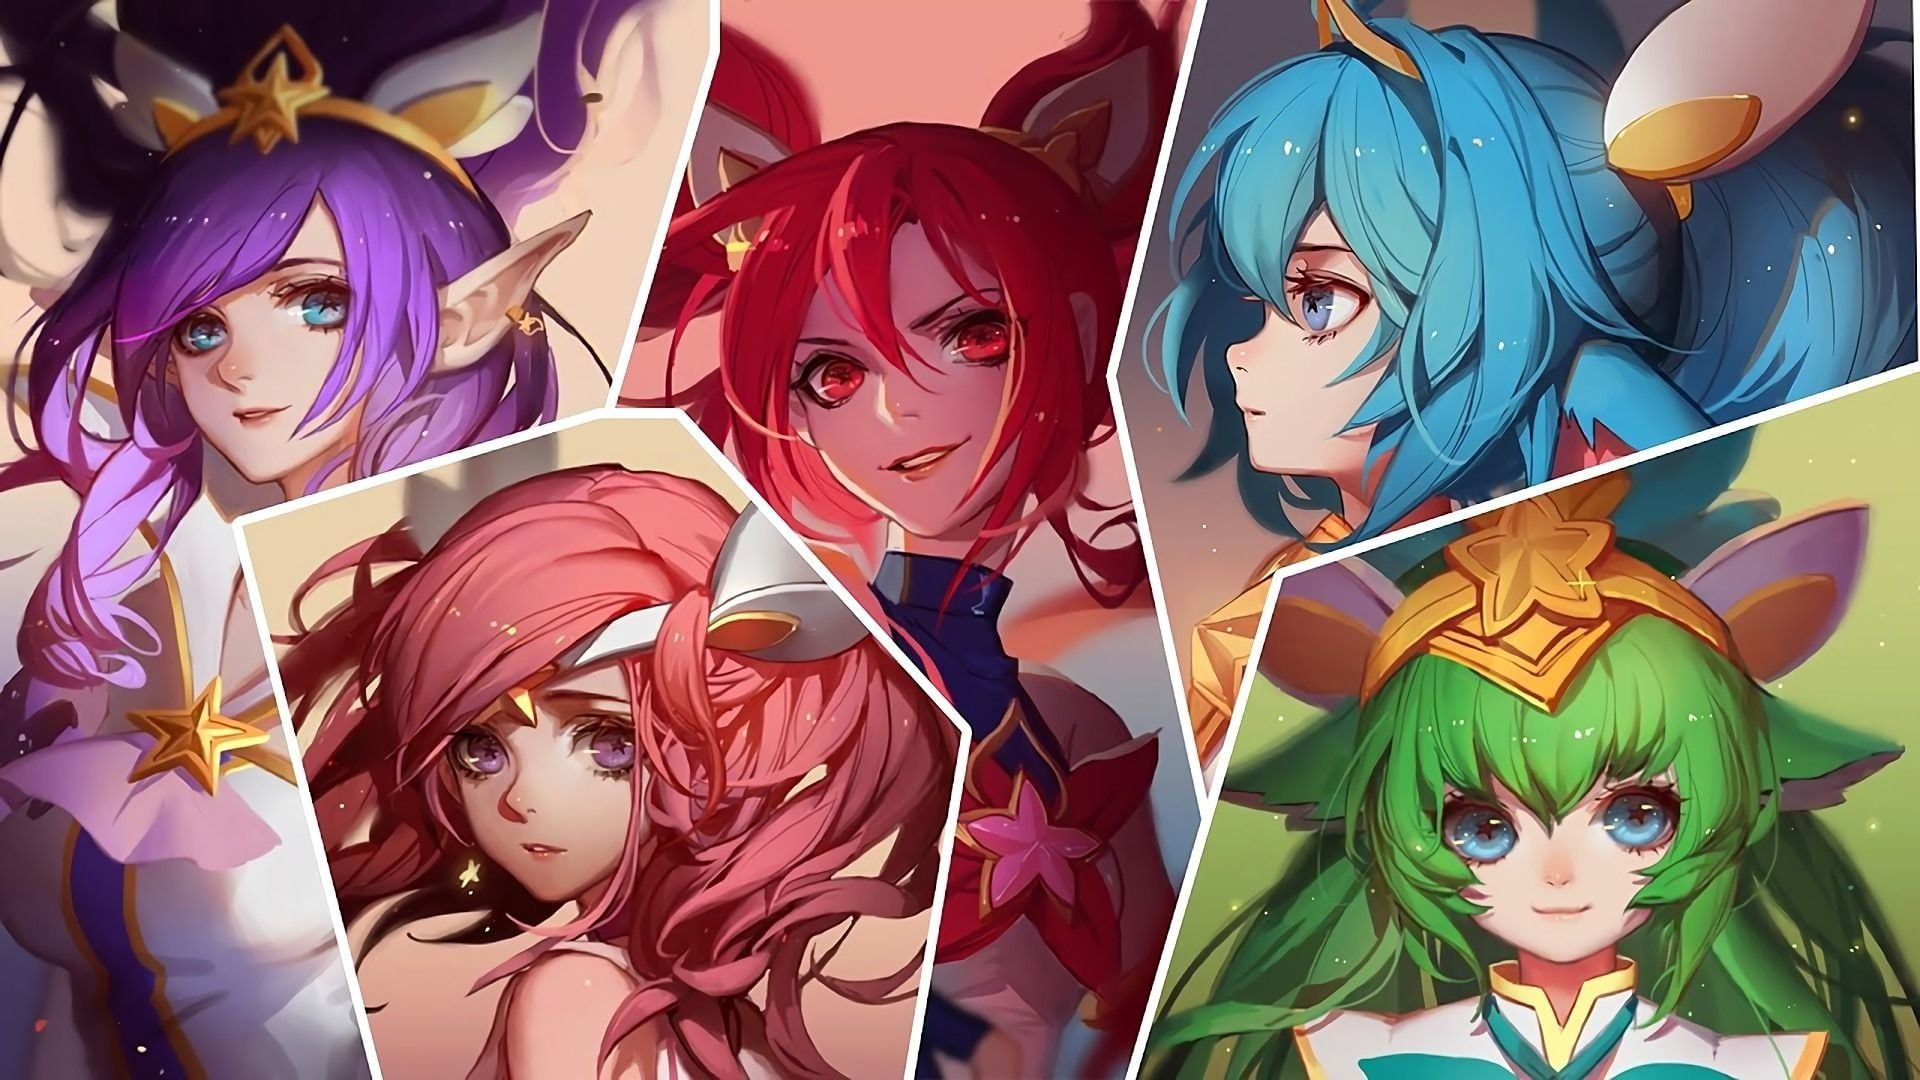 HD wallpaper: Video Game, League Of Legends, Janna (League Of Legends), Jinx (League Of Legends)